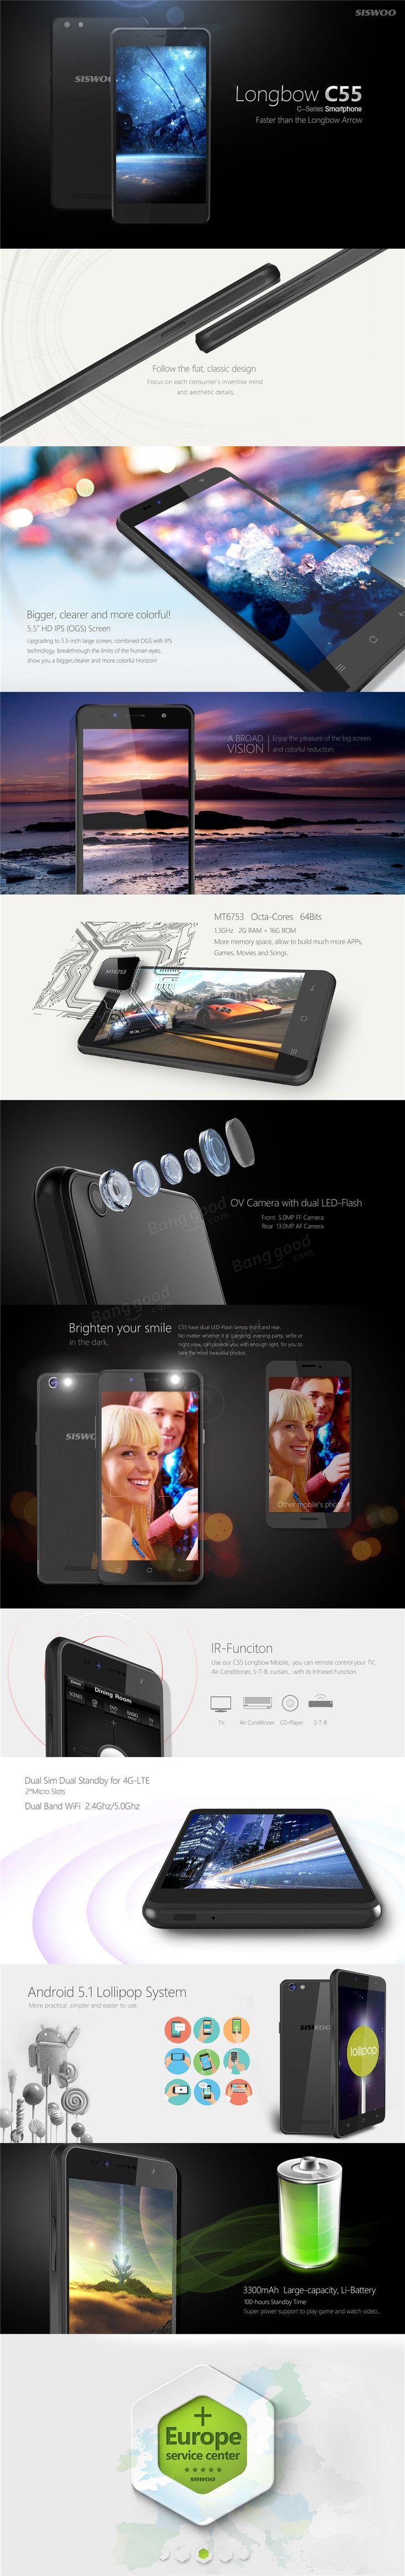 SISWOO C55 5.5 Inch 2GB RAM MTK6753 64bit 1.3GHz Octa-core Smartphone Sale-Banggood.com